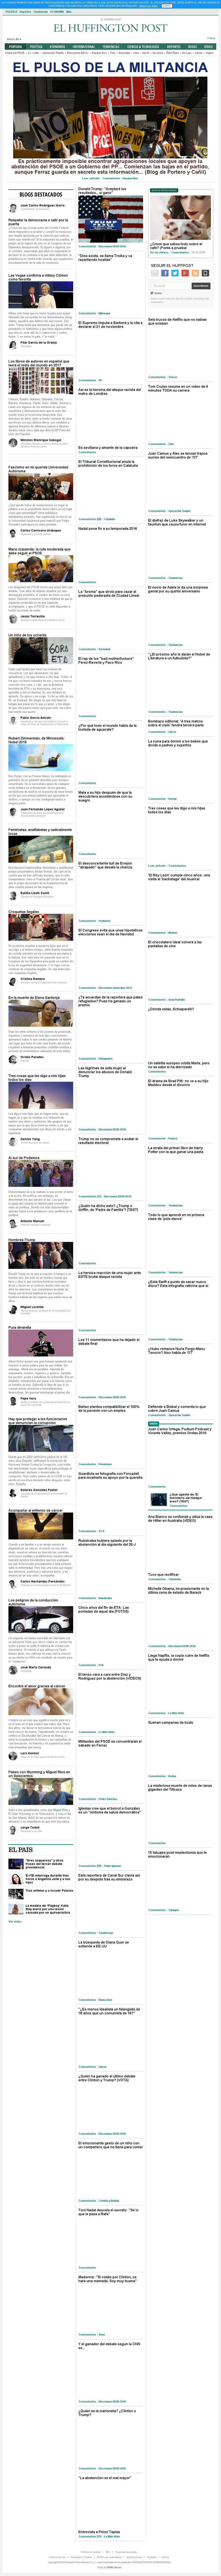 El Huffington Post (Spain) at Friday Oct. 21, 2016, 1:06 a.m. UTC